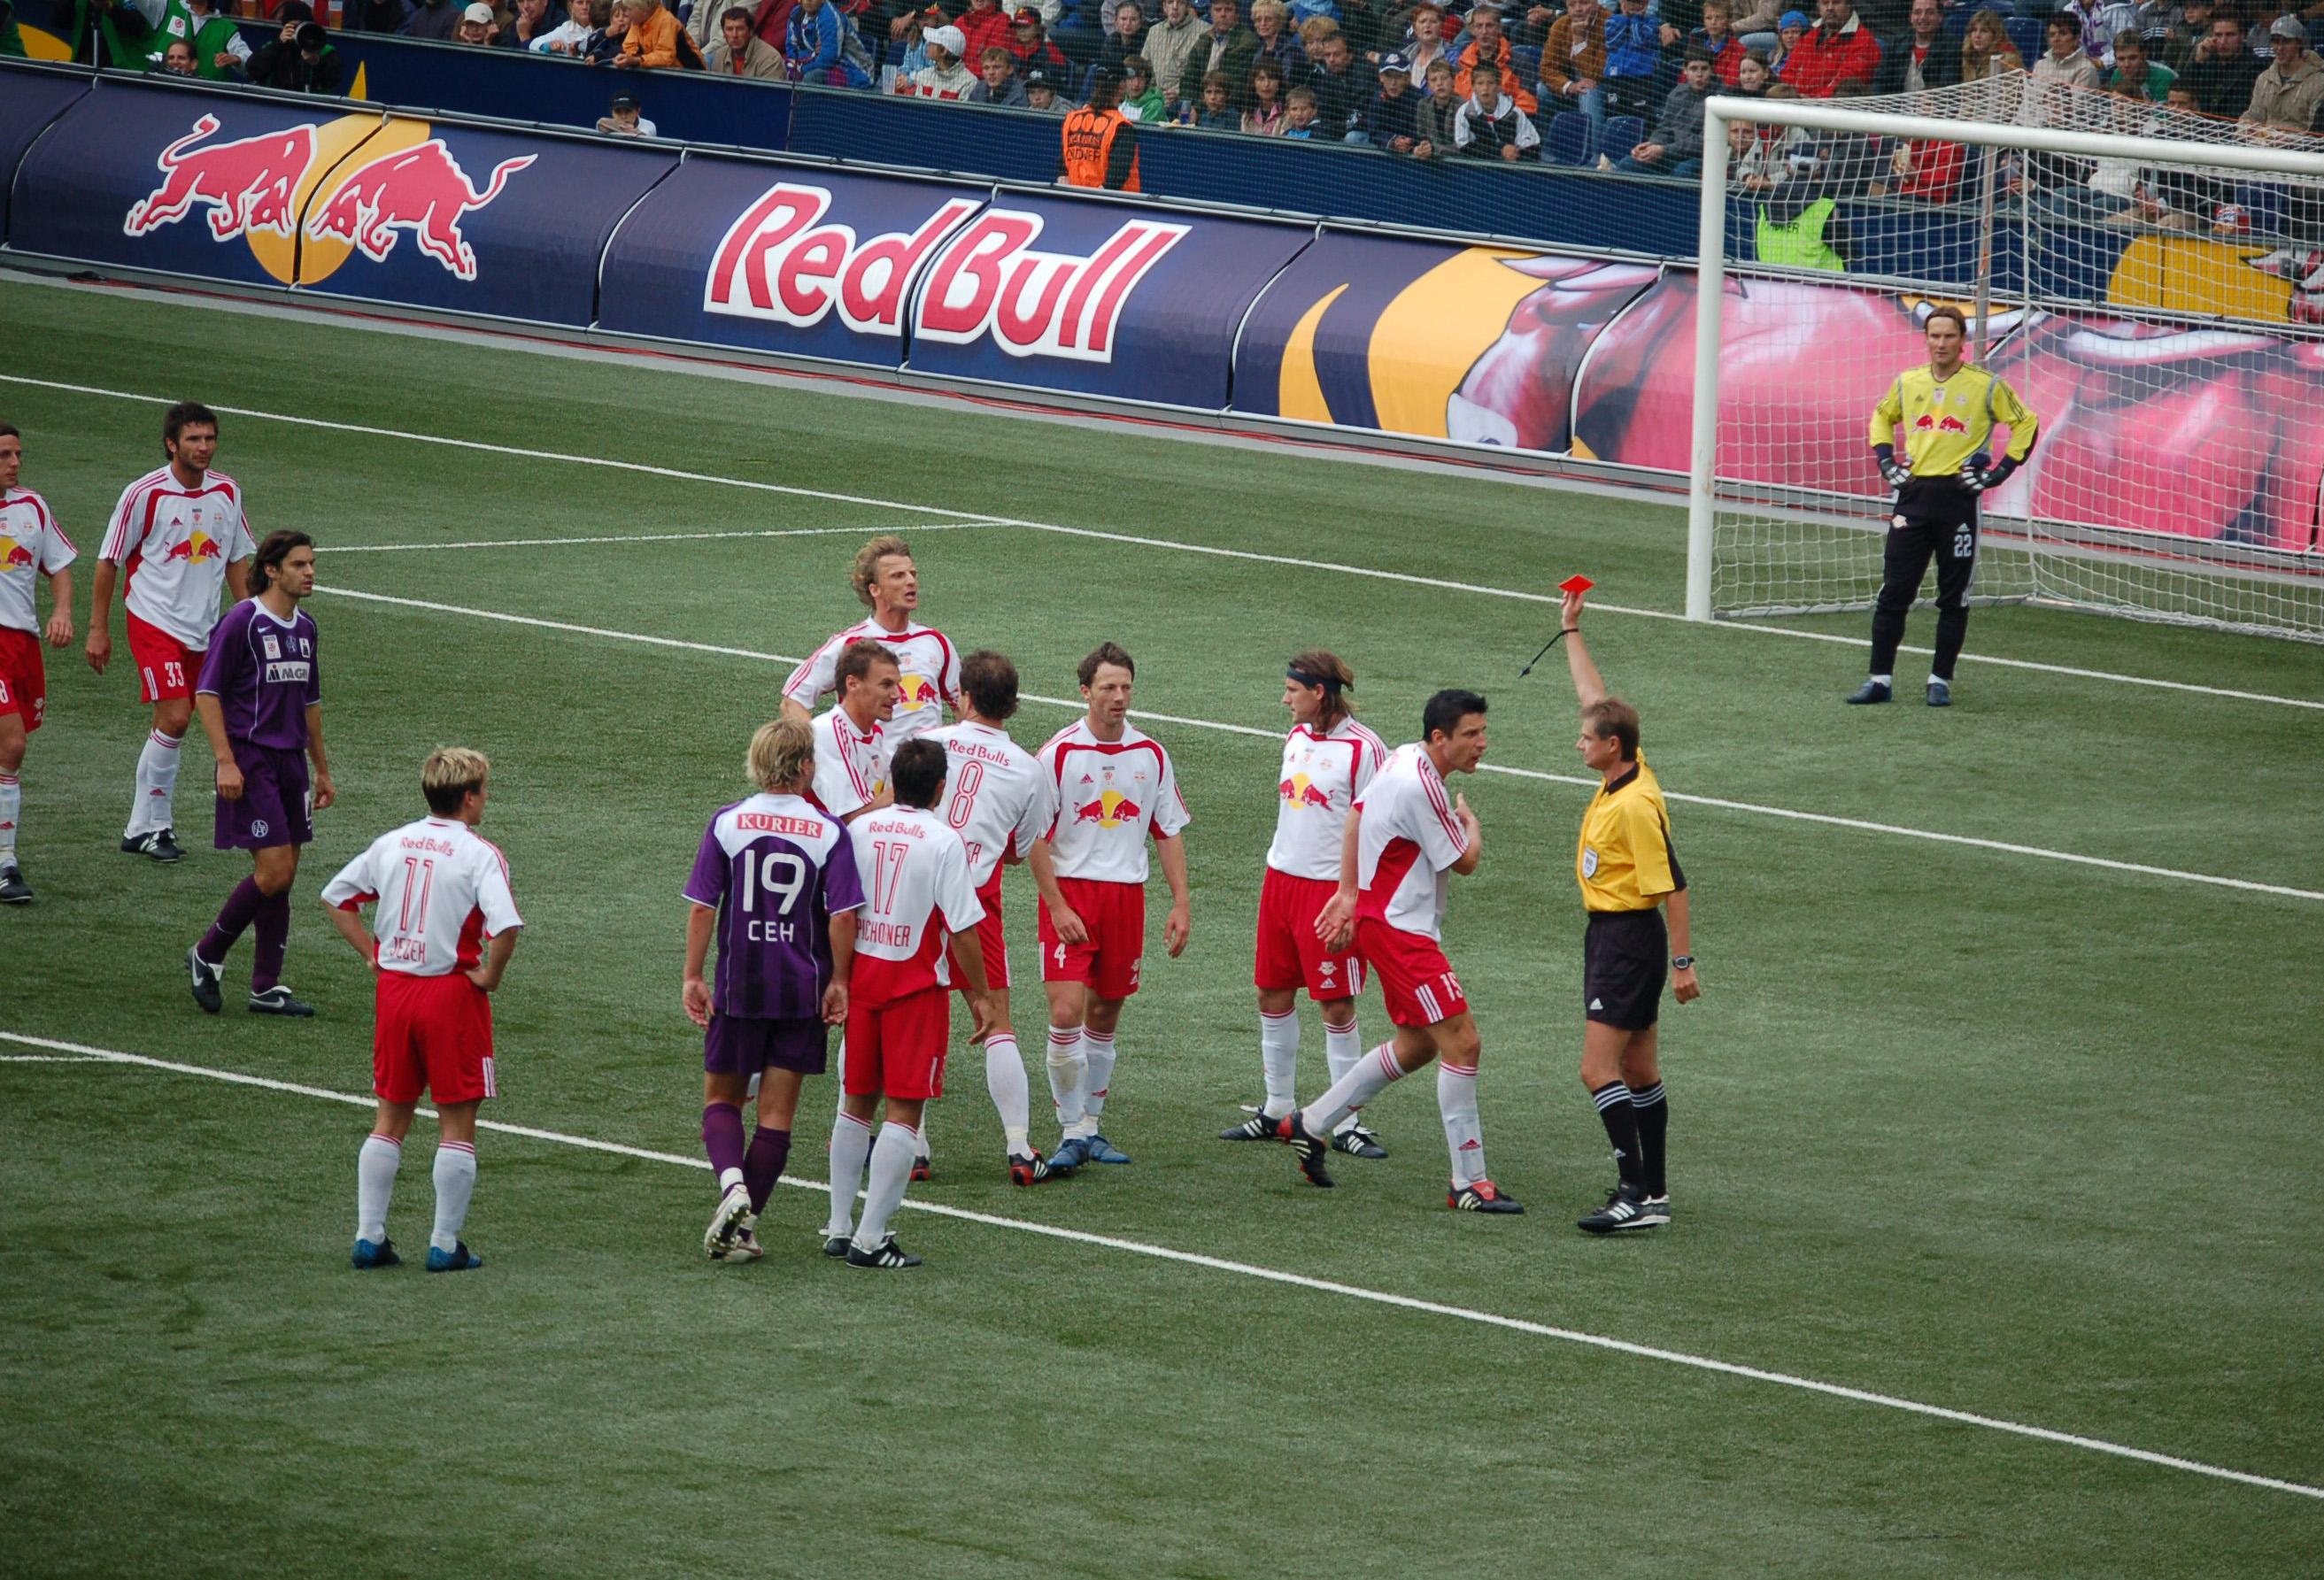 Rote_Karte-RB_Salzburg-18-09-2005